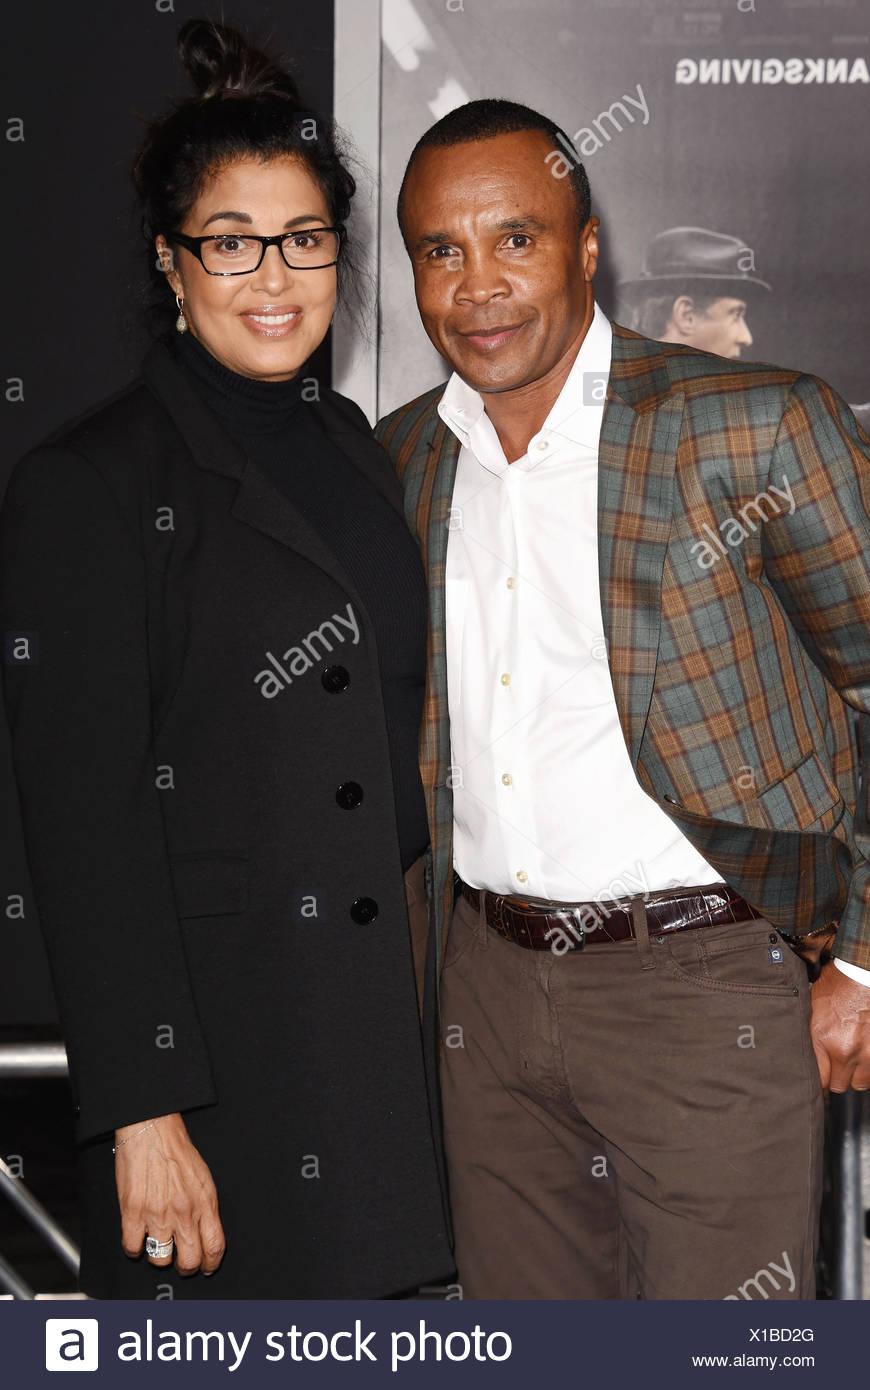 Wife Professional Former Boxer Bernadette LeonardlAnd Sugar Ray sdthCQr